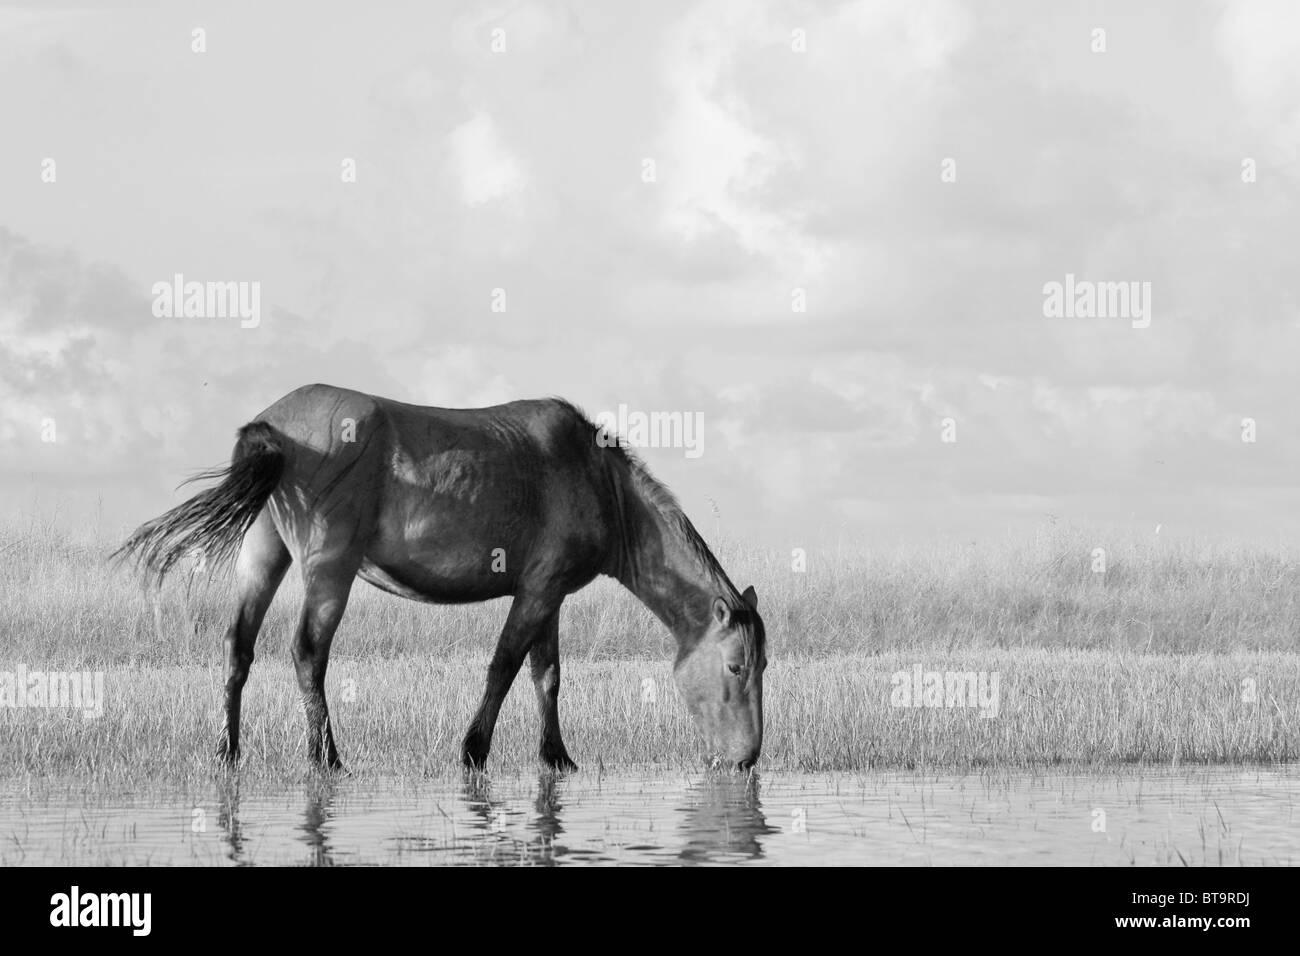 A wild Mustang feeds on marsh grass along the North Carolina coast. - Stock Image